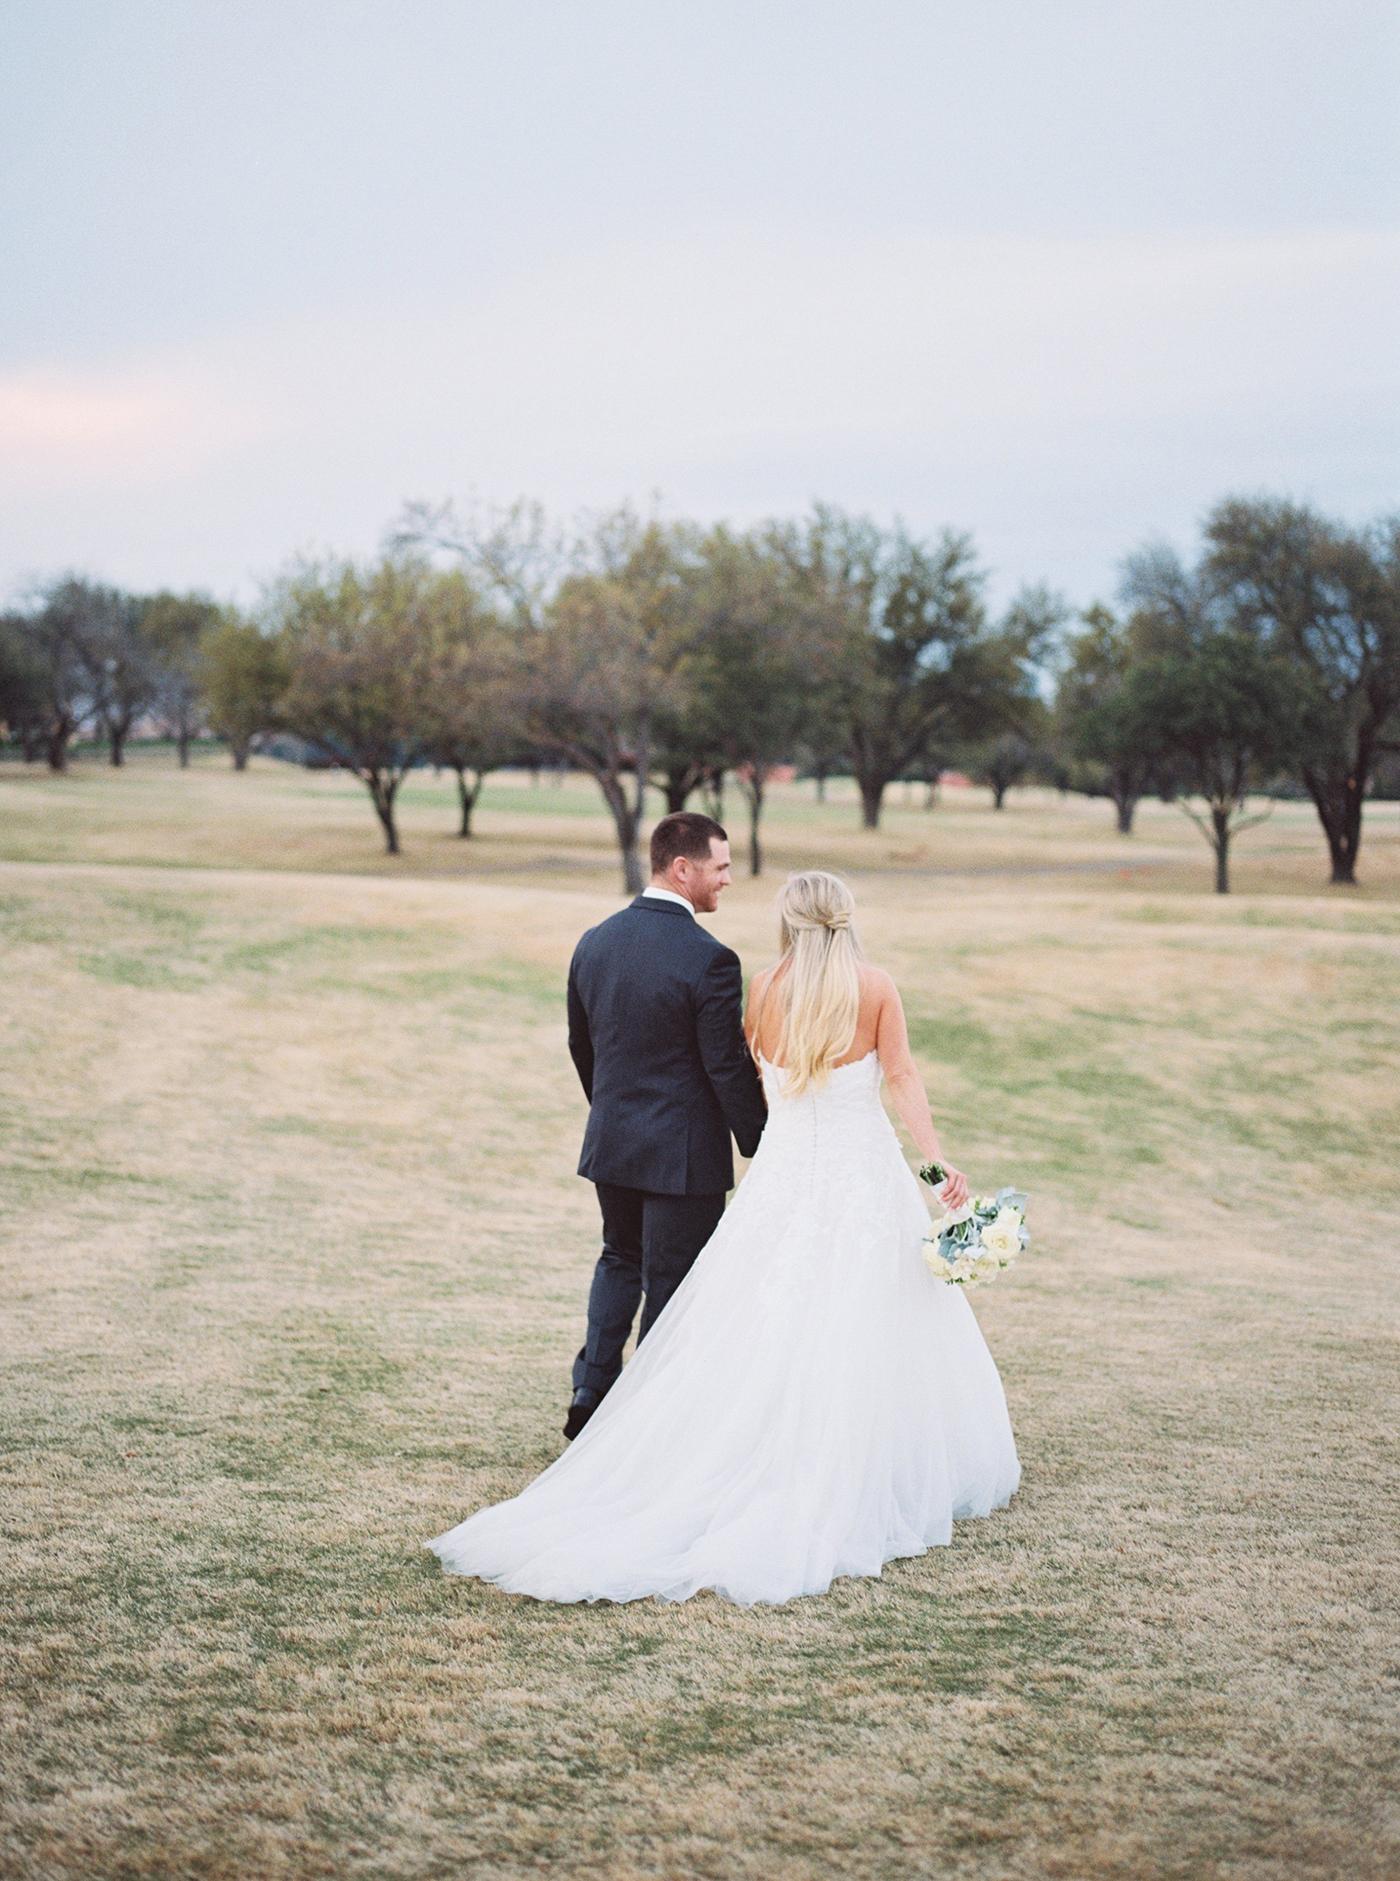 DFW Wedding Planner - Caroline + Jeff at The Four Seasons Hotel Wedding - Allday Events - 128.jpg